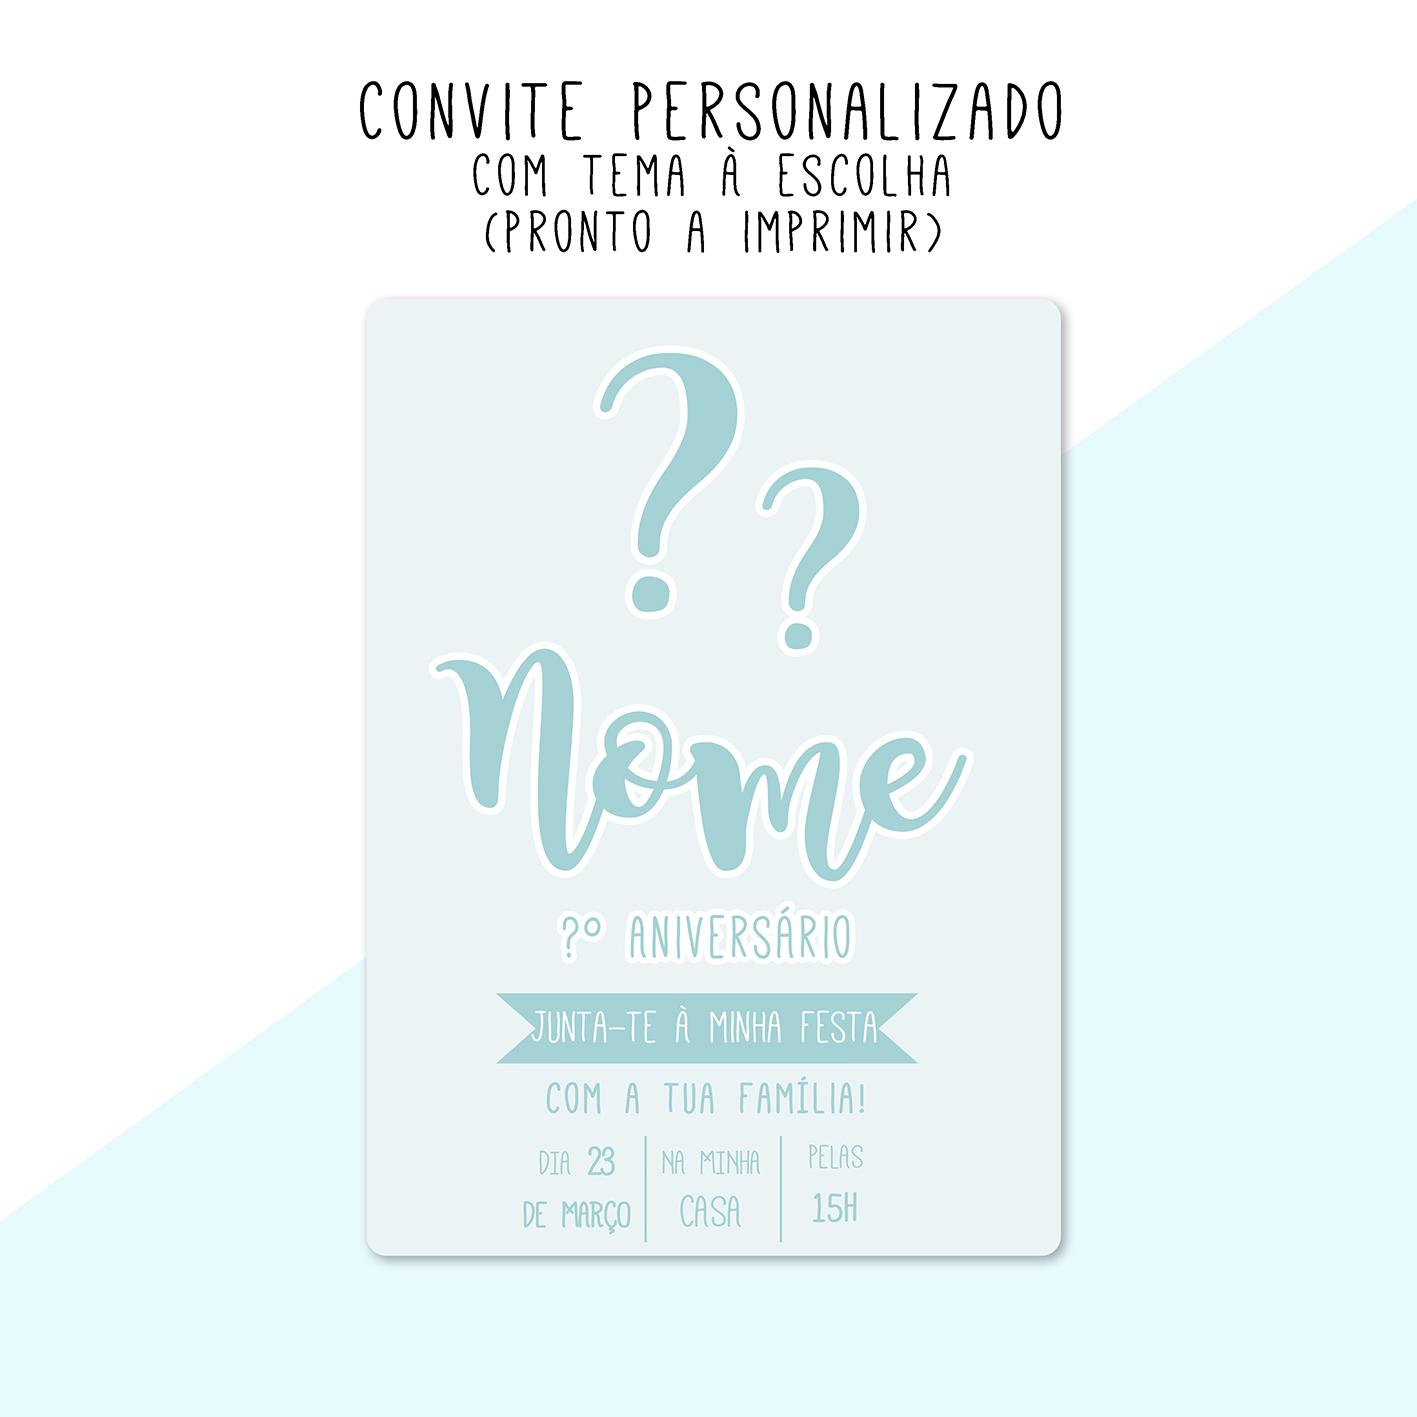 CONVITE DIGITAL - READY TO PRINT - TEMA À ESCOLHA